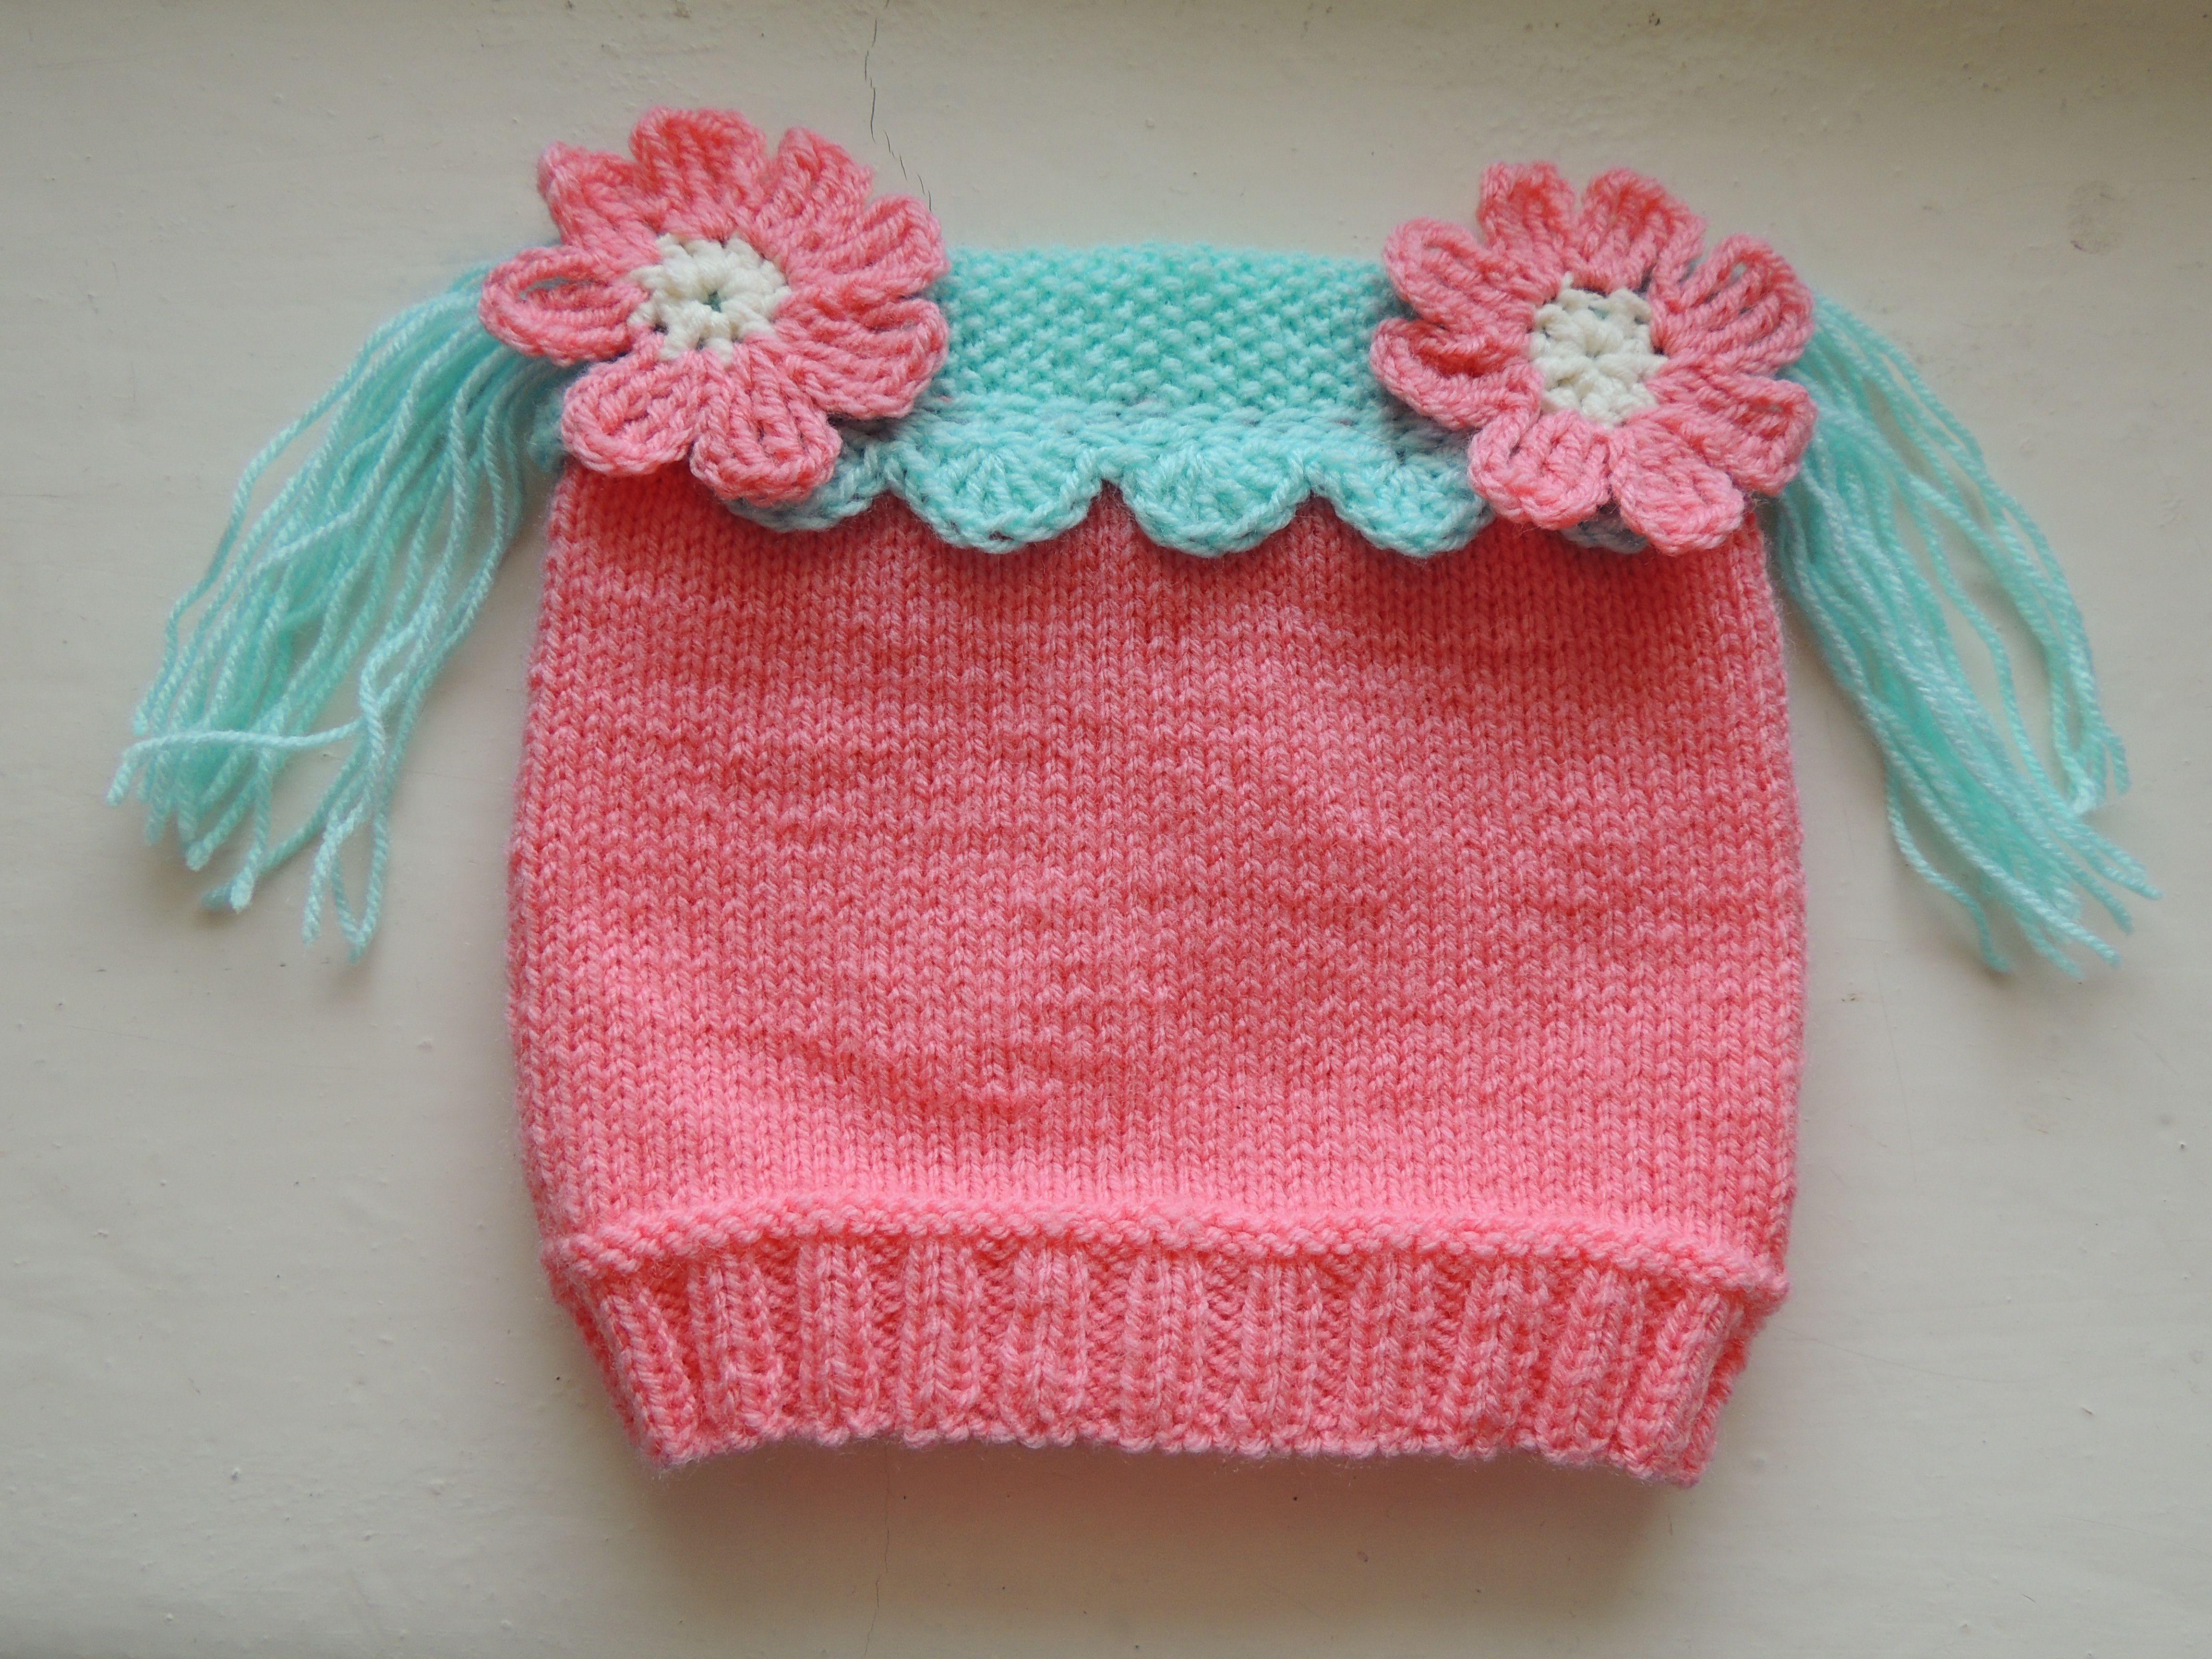 осенняя шапочка шапкадлядевочки шапочкаклубничка весенняяшапка шапка цветочки детскаяшапка